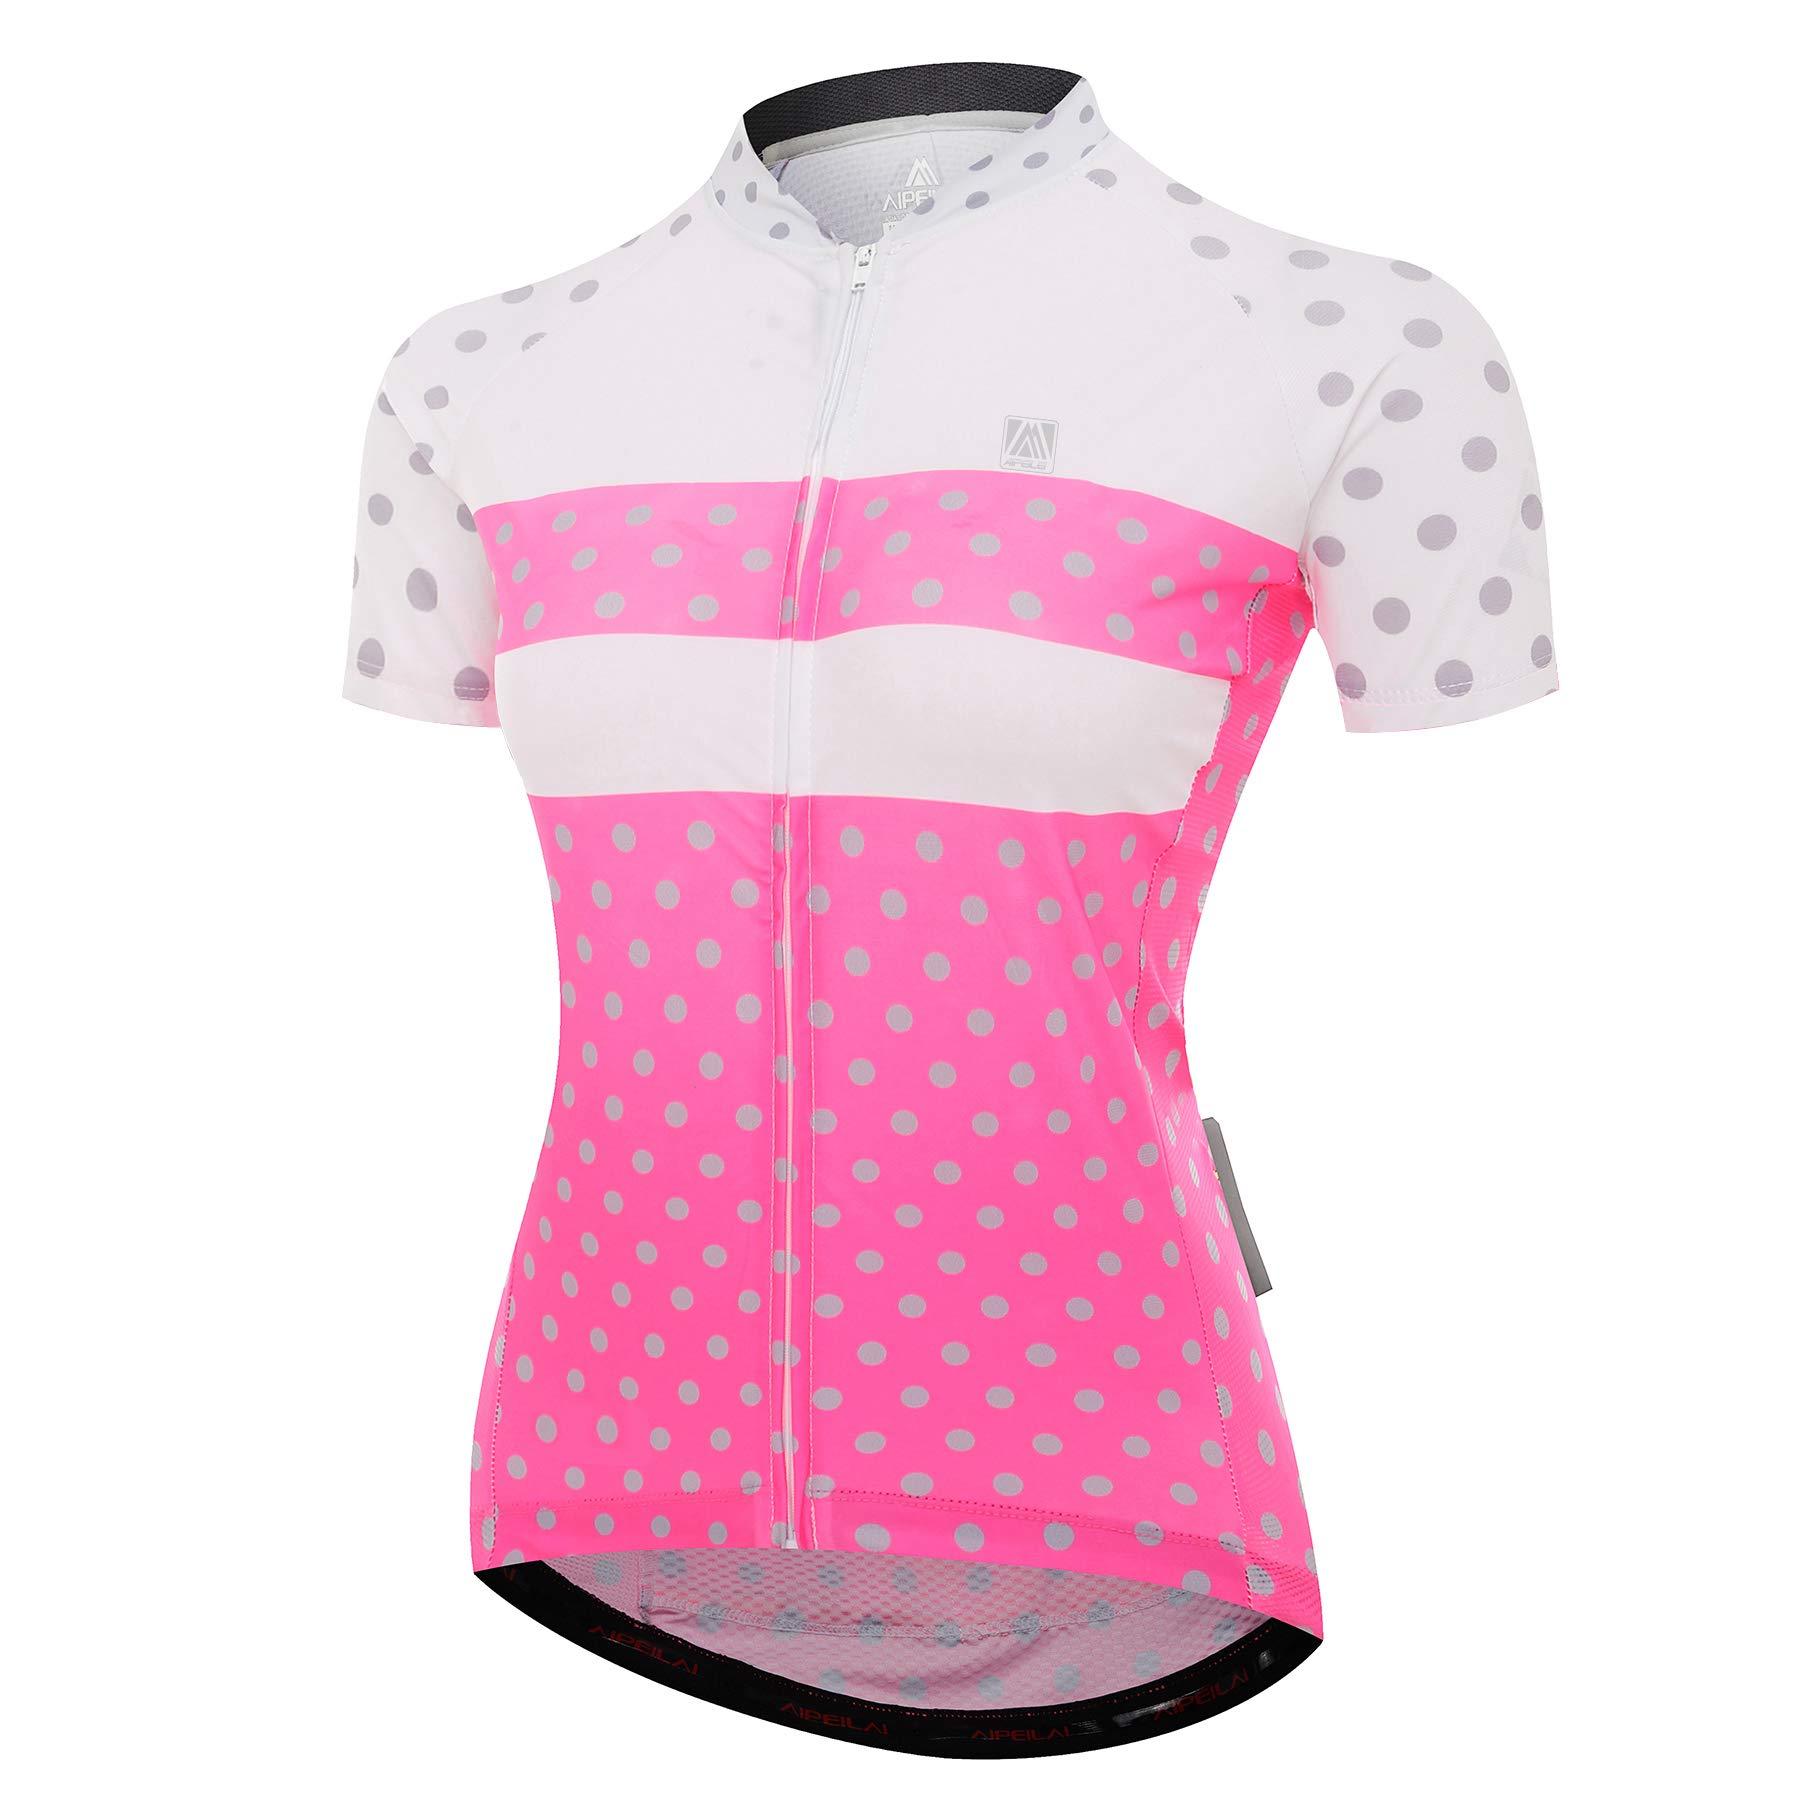 Women Cycling Jersey Short Sleeve Cycling Clothing Sets Ladies Jacket Cycling Shirt with Shorts Padded Pants